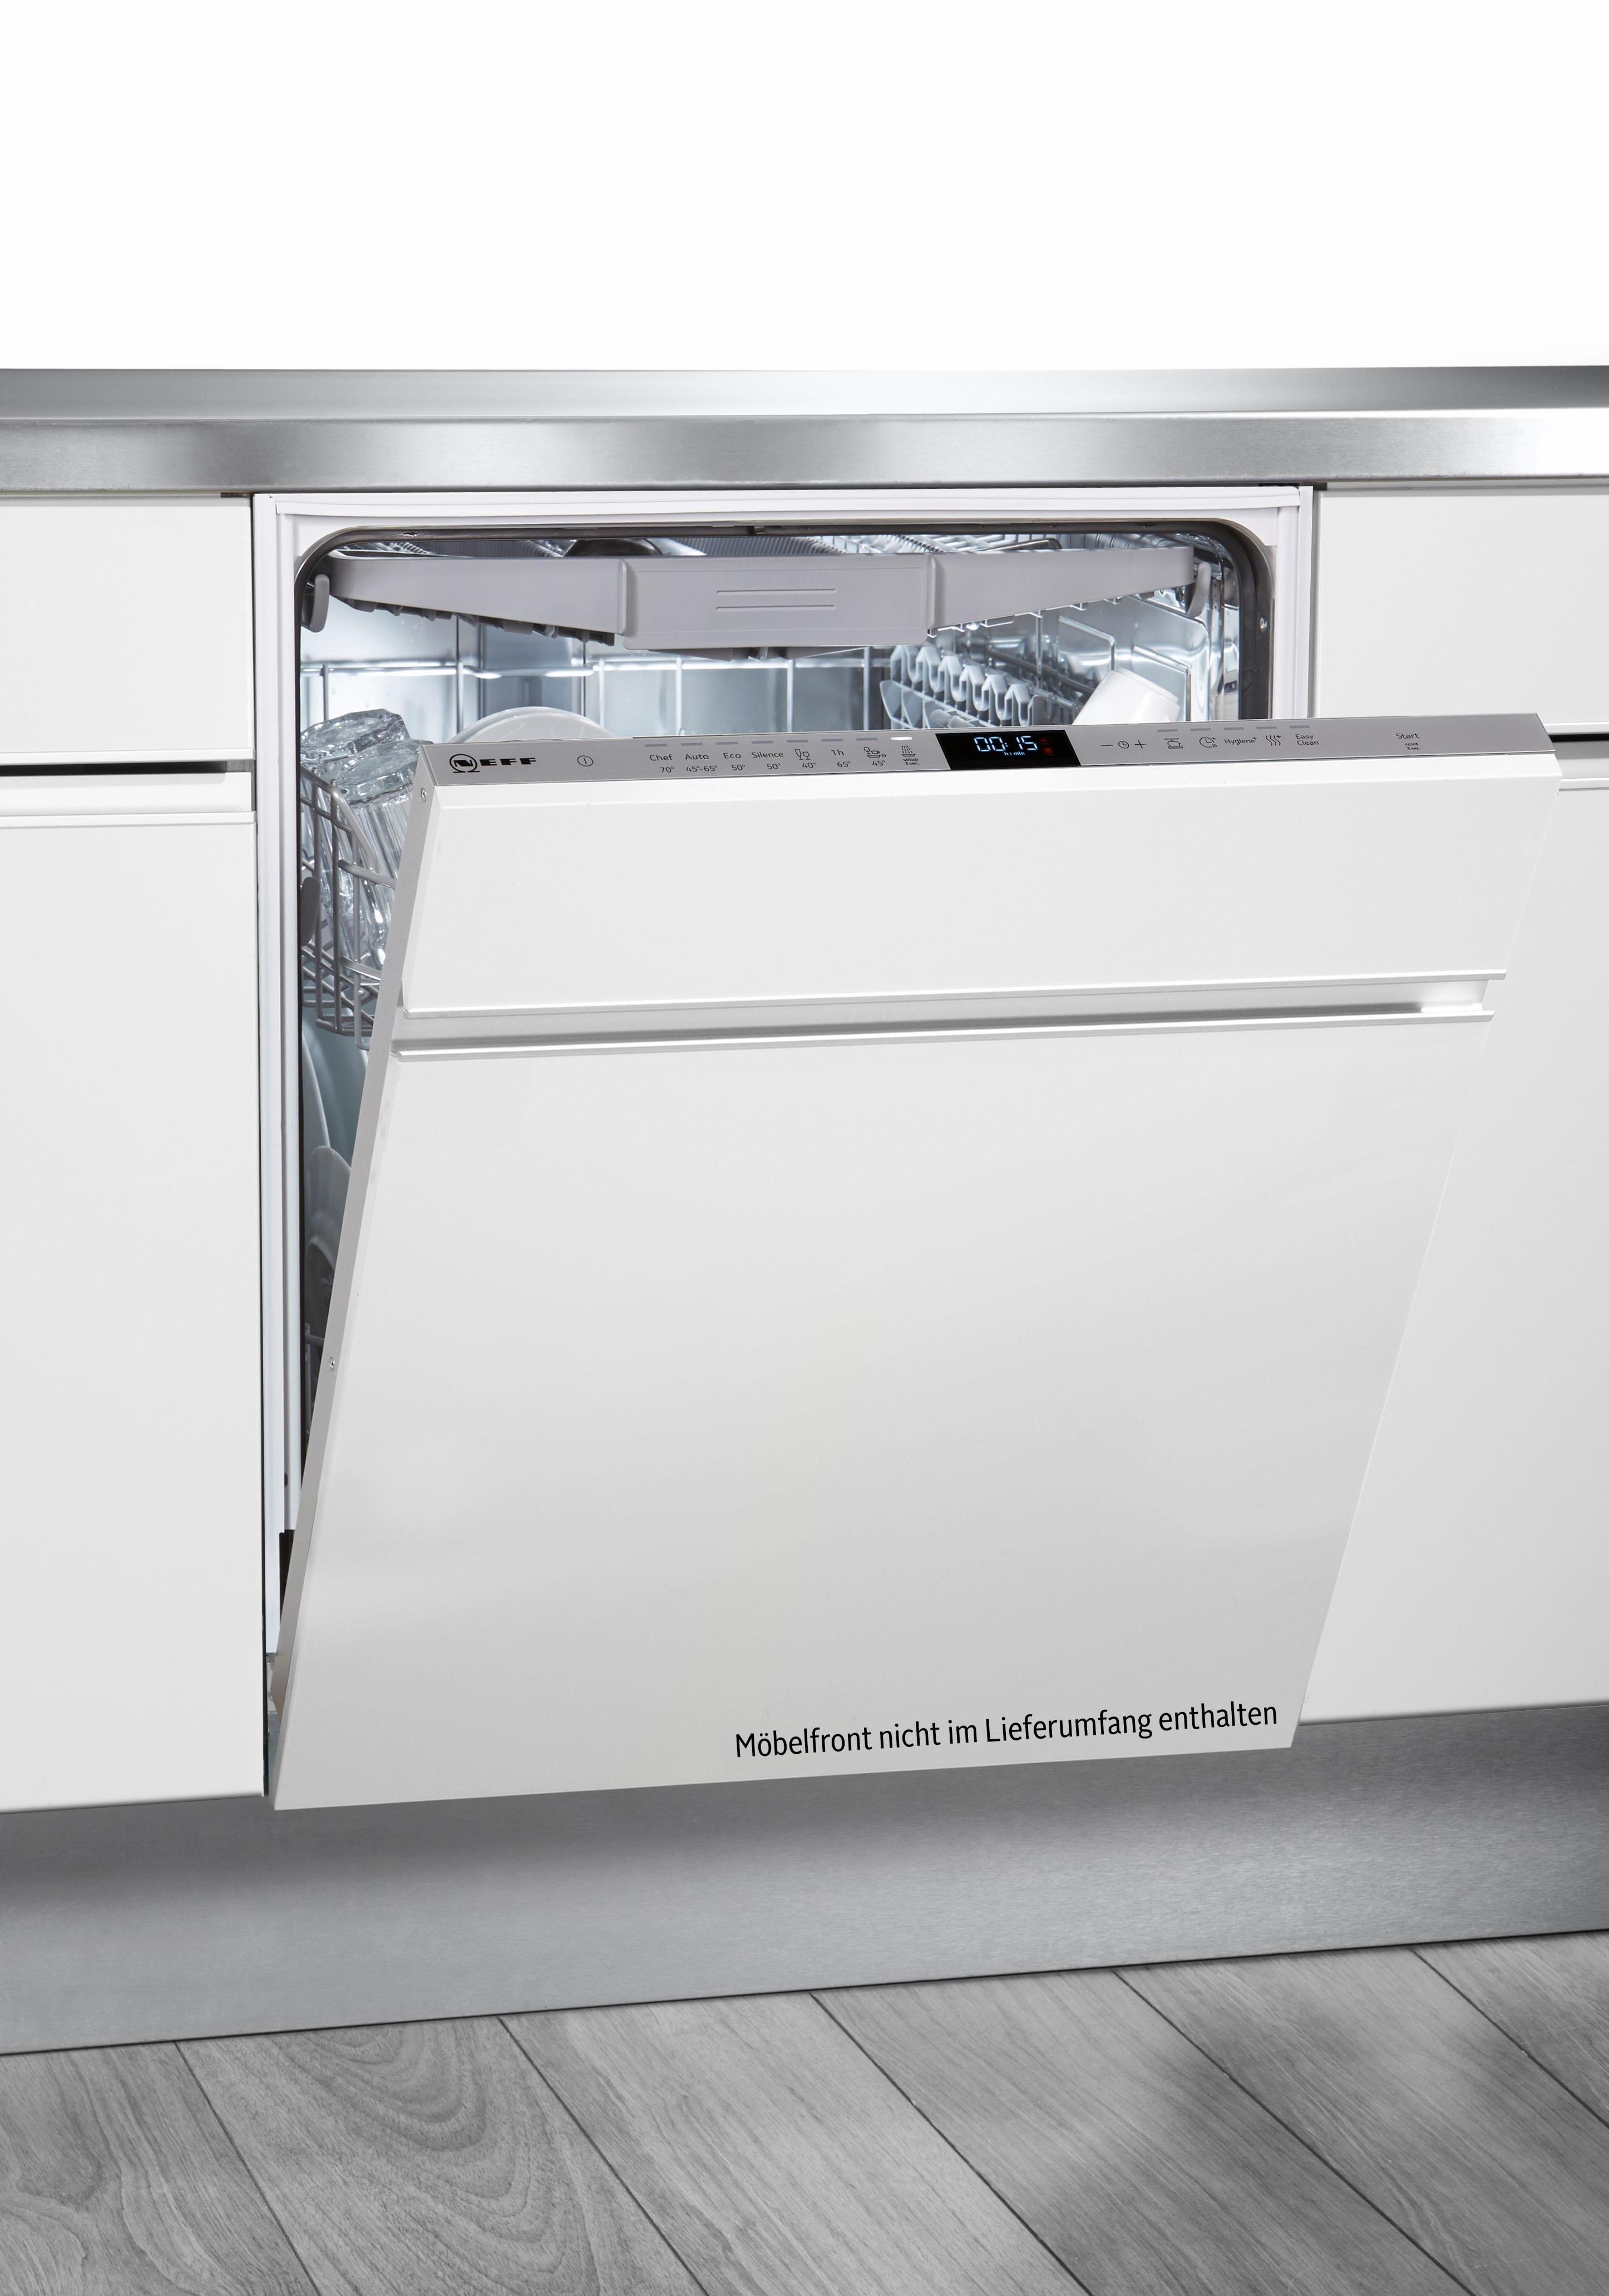 Neff volledig integreerbare inbouwvaatwasser Serie 5 S525M80X1E, A++, 9,5 l, 14 standaardcouverts bestellen: 14 dagen bedenktijd